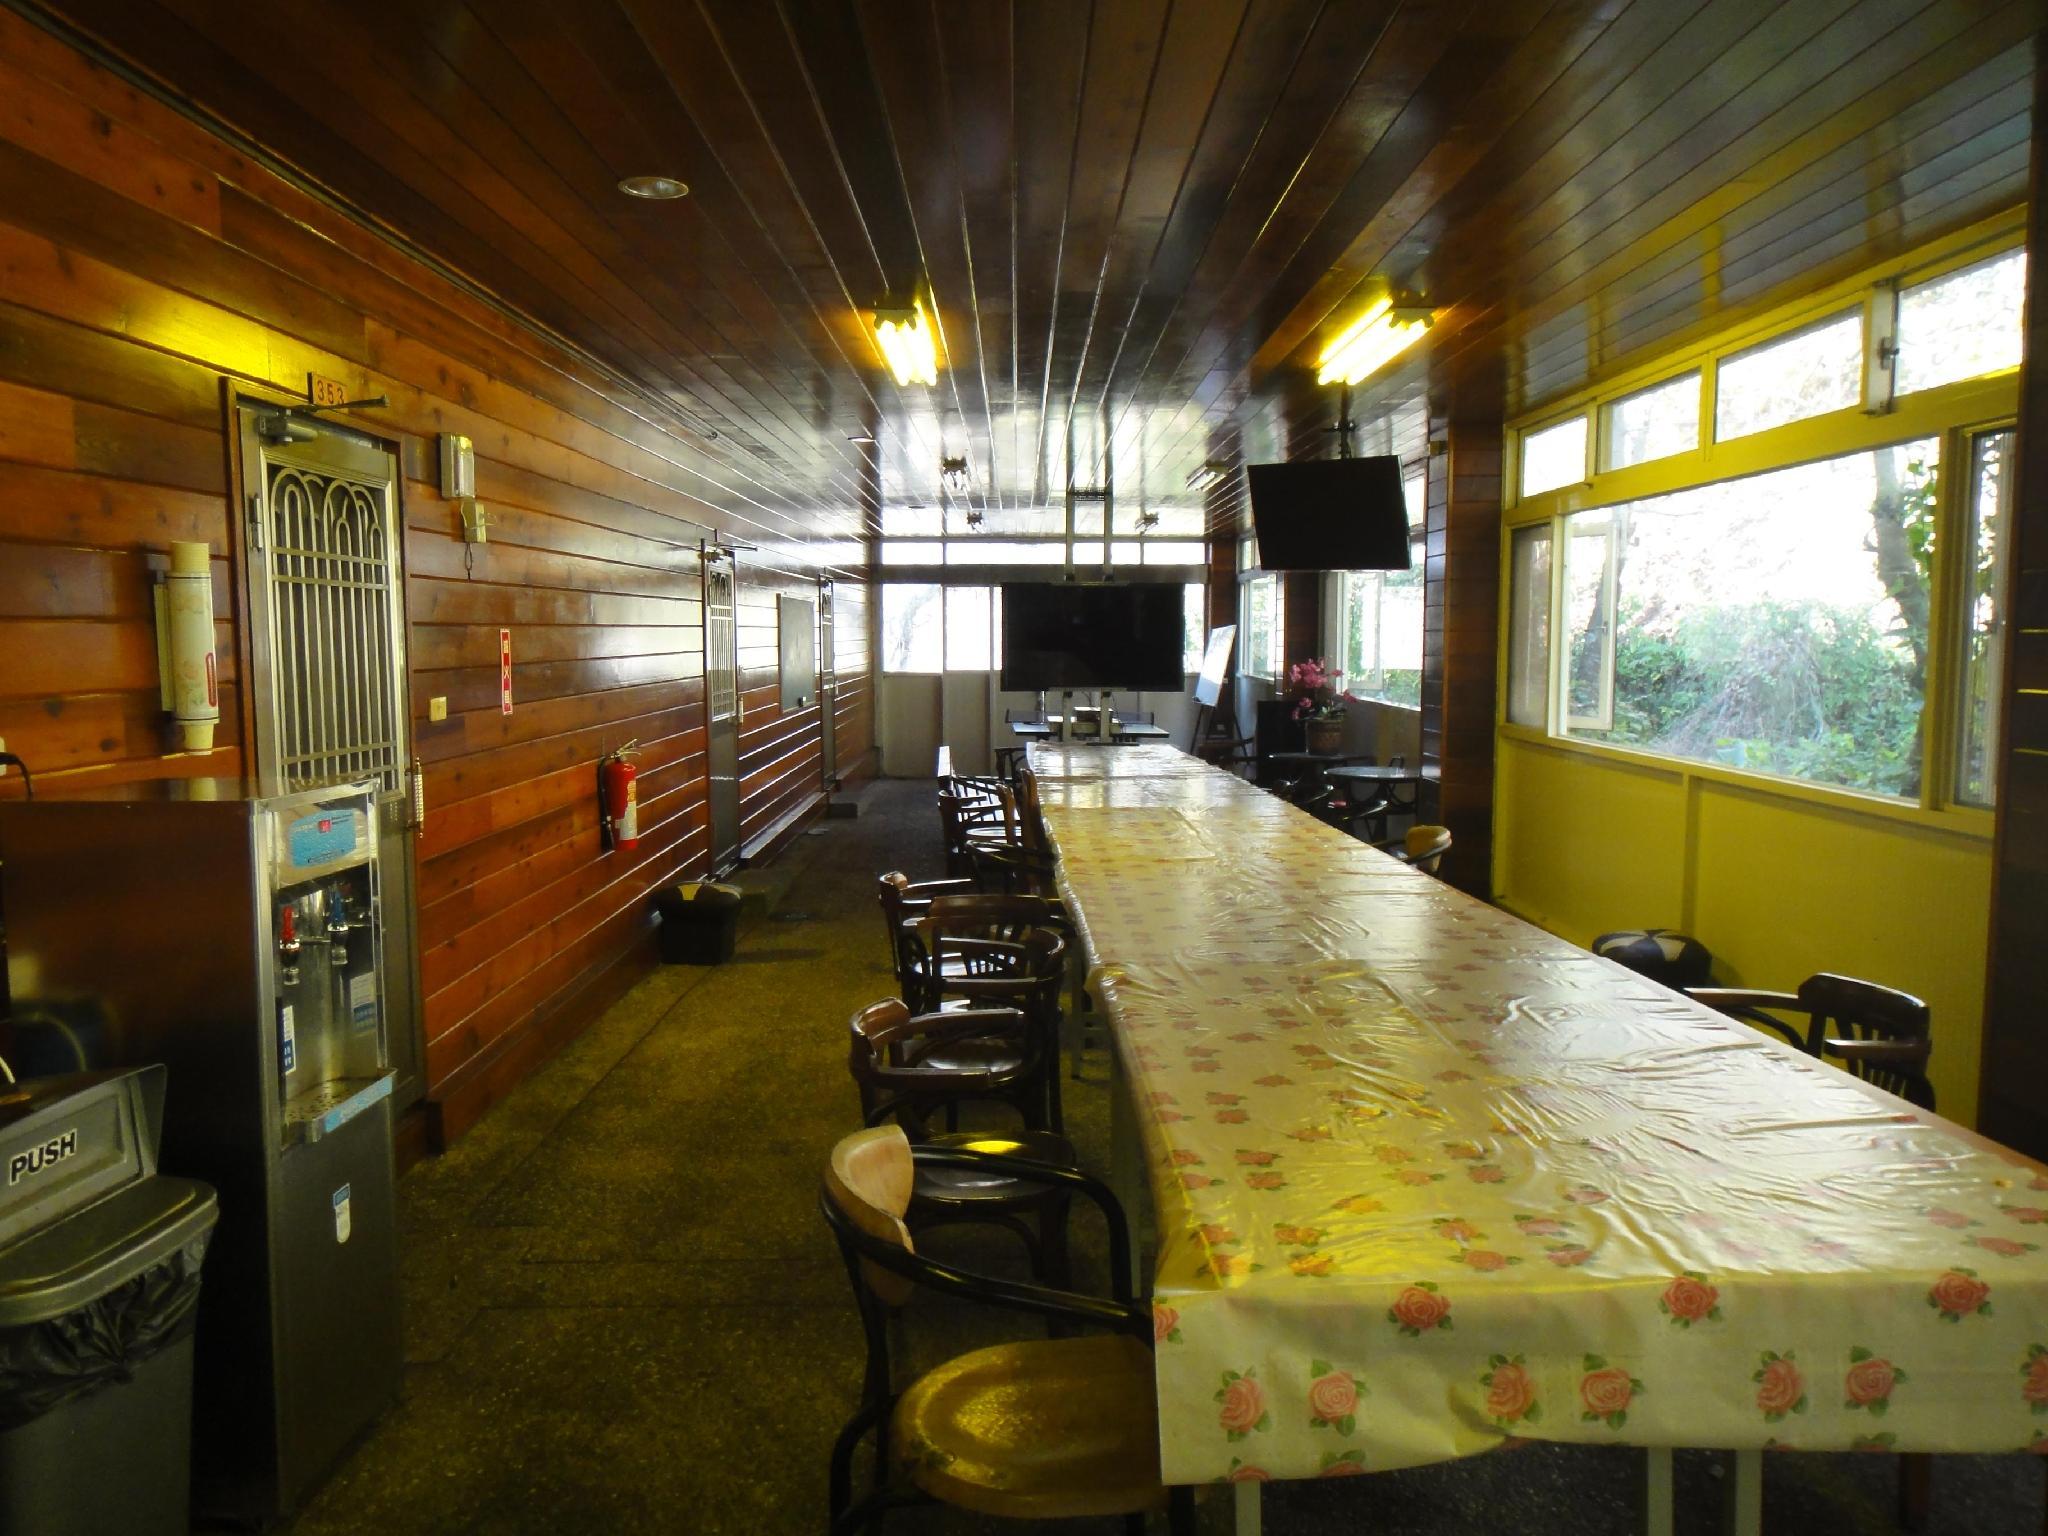 🟊🟊🟊 Bunbury Fruit Ranch Bed and Breakfast - Nantou - Taiwan